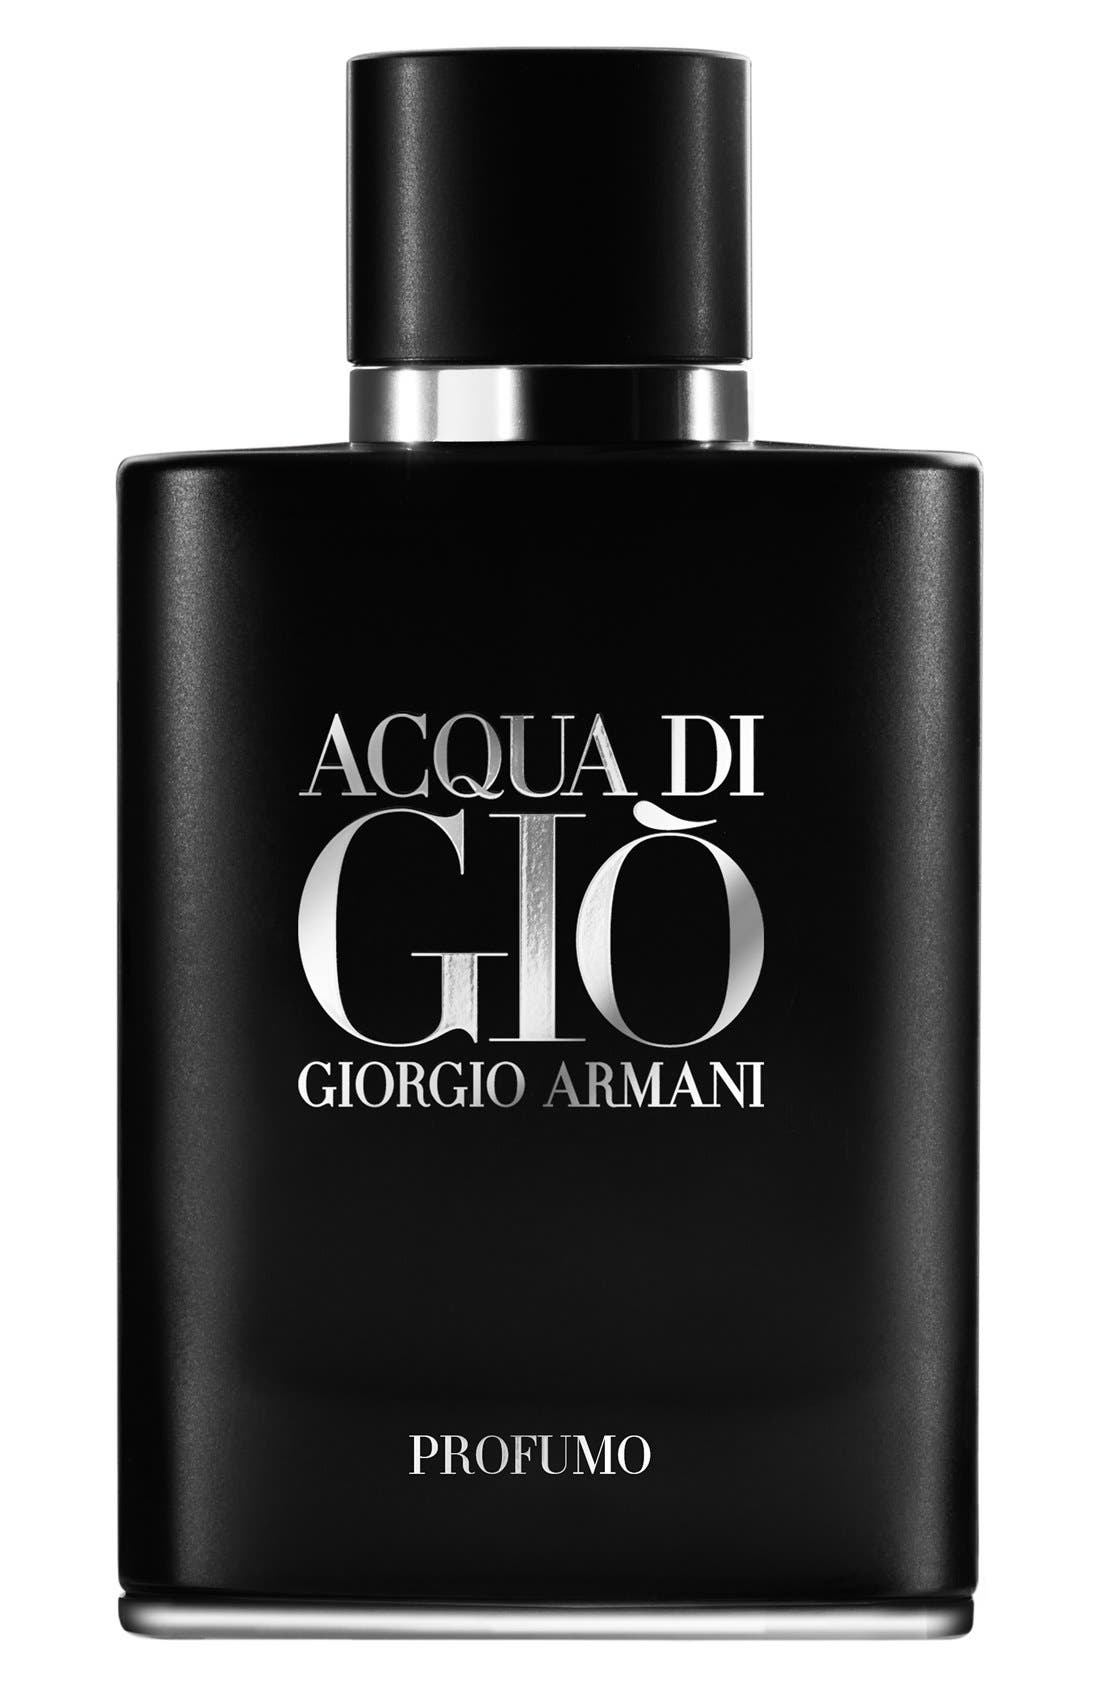 Acqua di Giò - Profumo Fragrance,                             Main thumbnail 1, color,                             NO COLOR